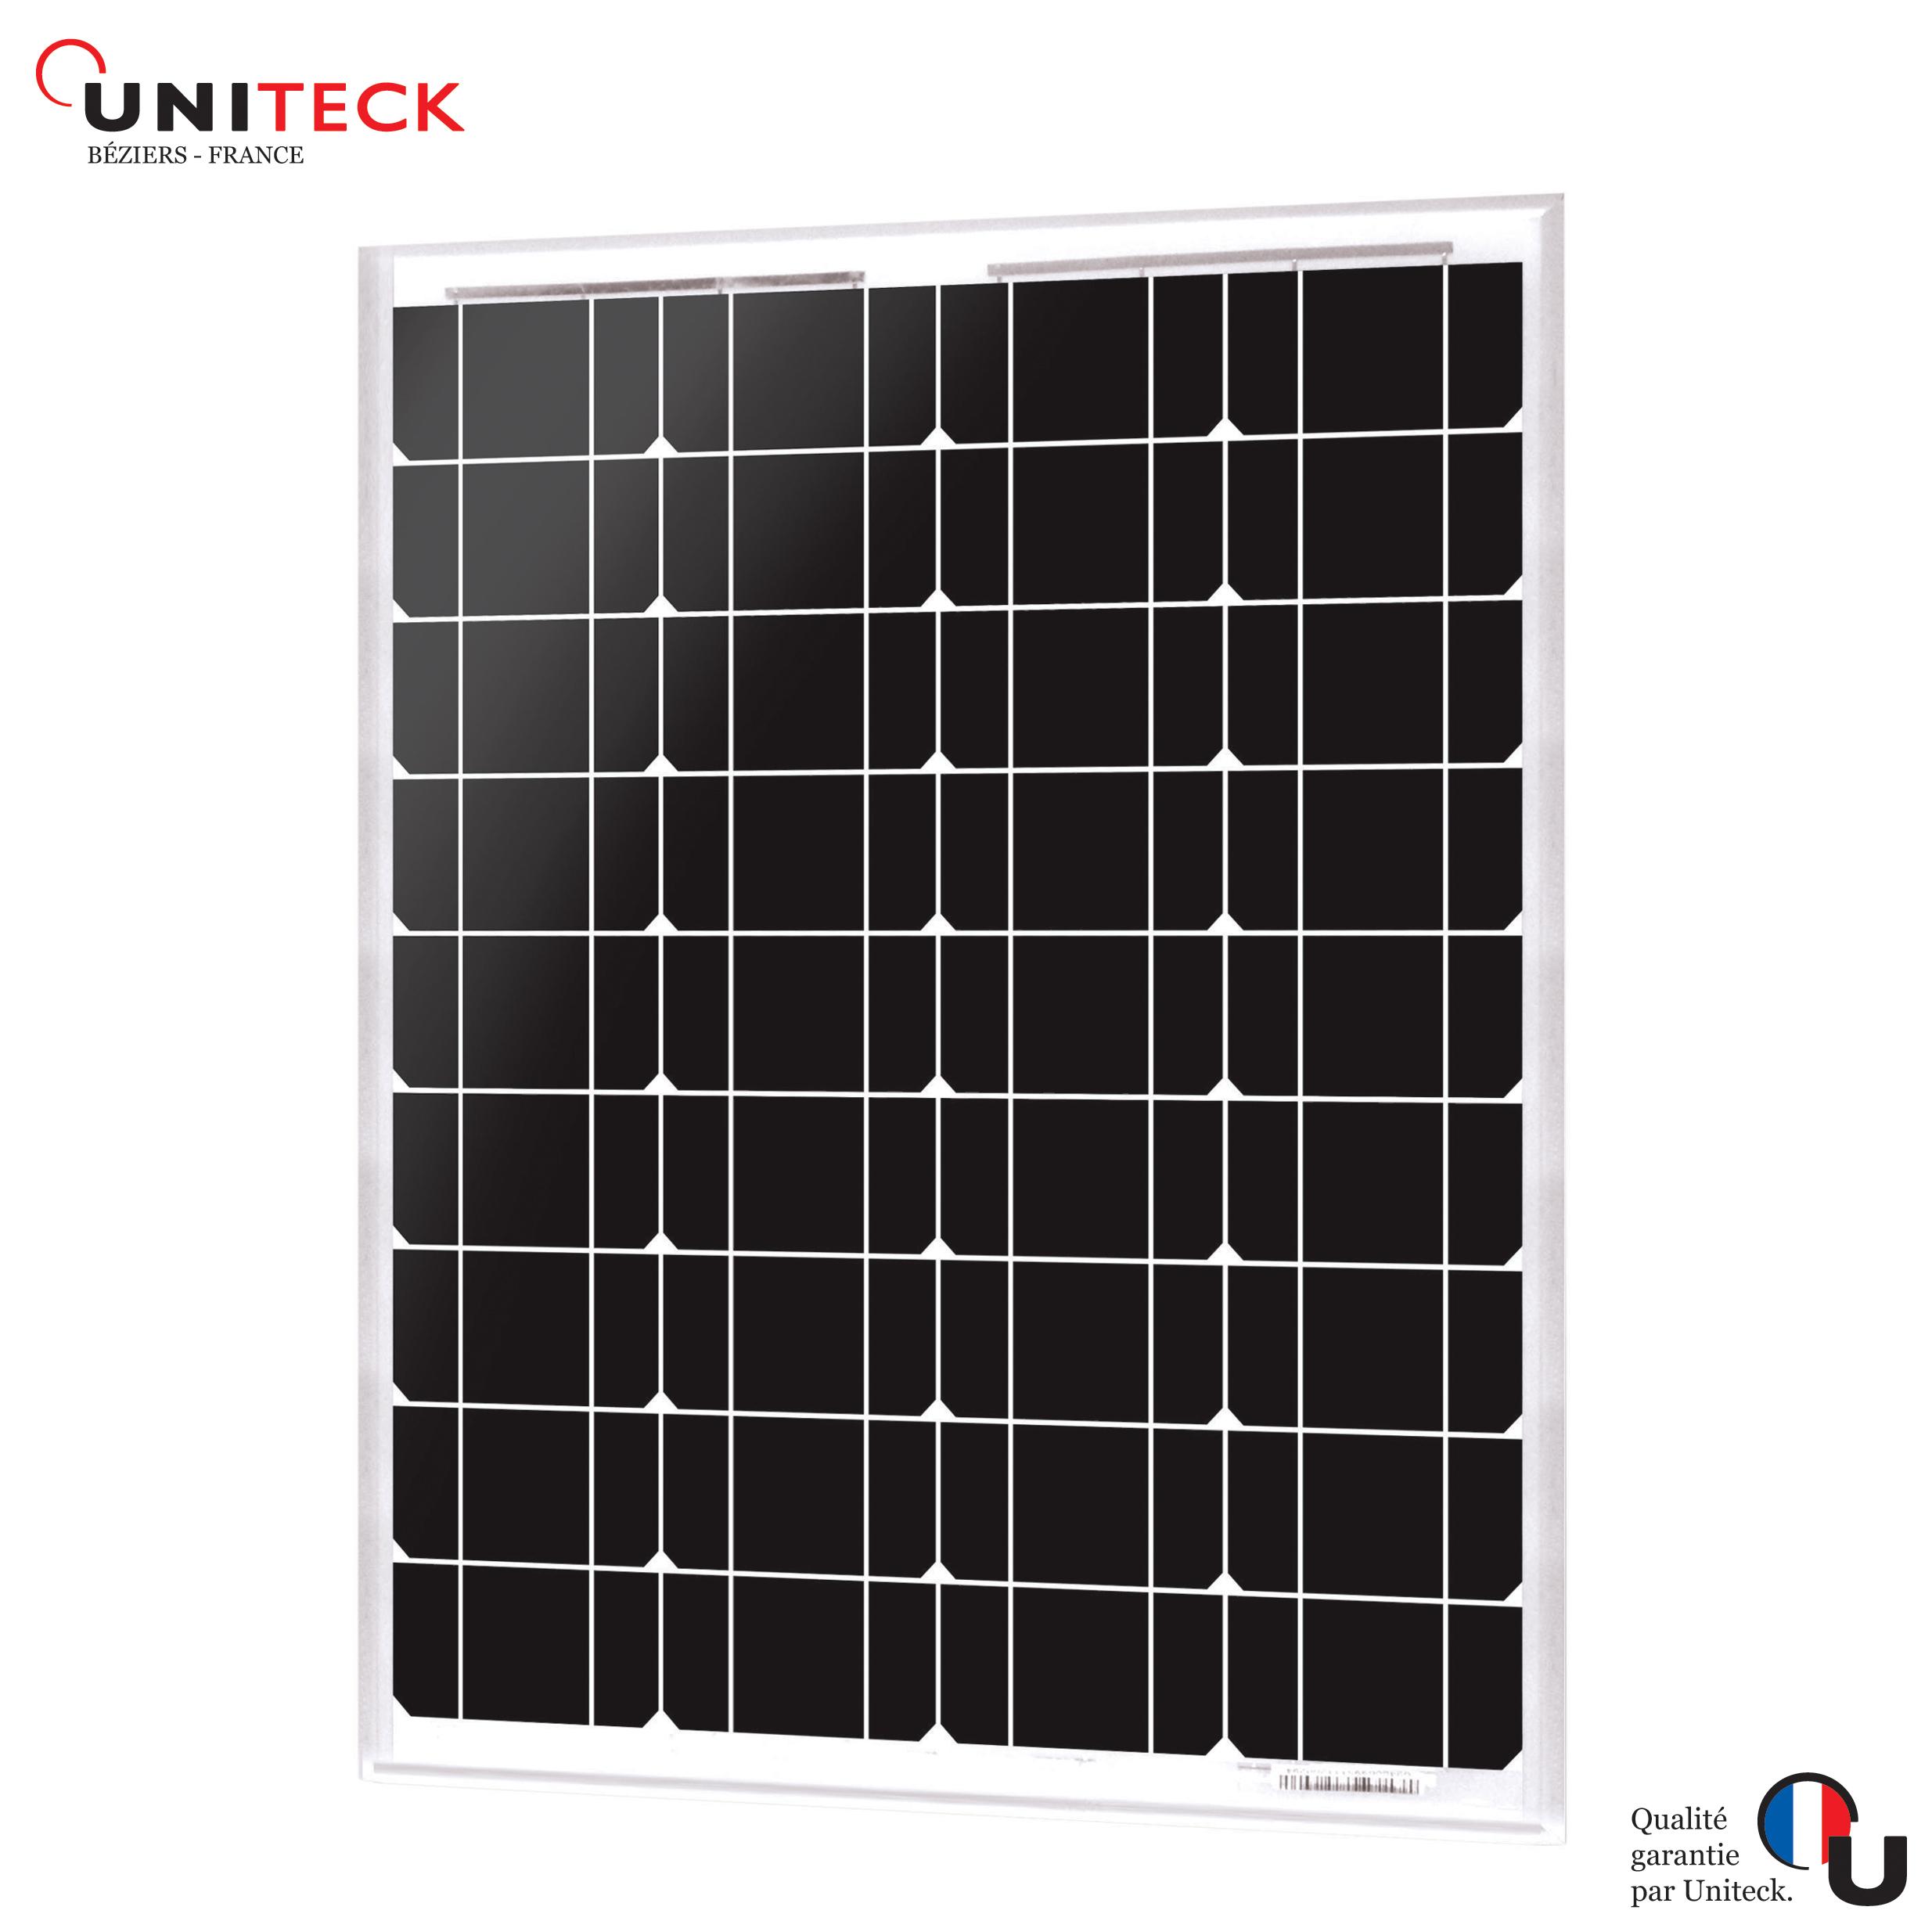 panneau solaire polycristallin 10w 12v unisun p fabricant fran ais. Black Bedroom Furniture Sets. Home Design Ideas